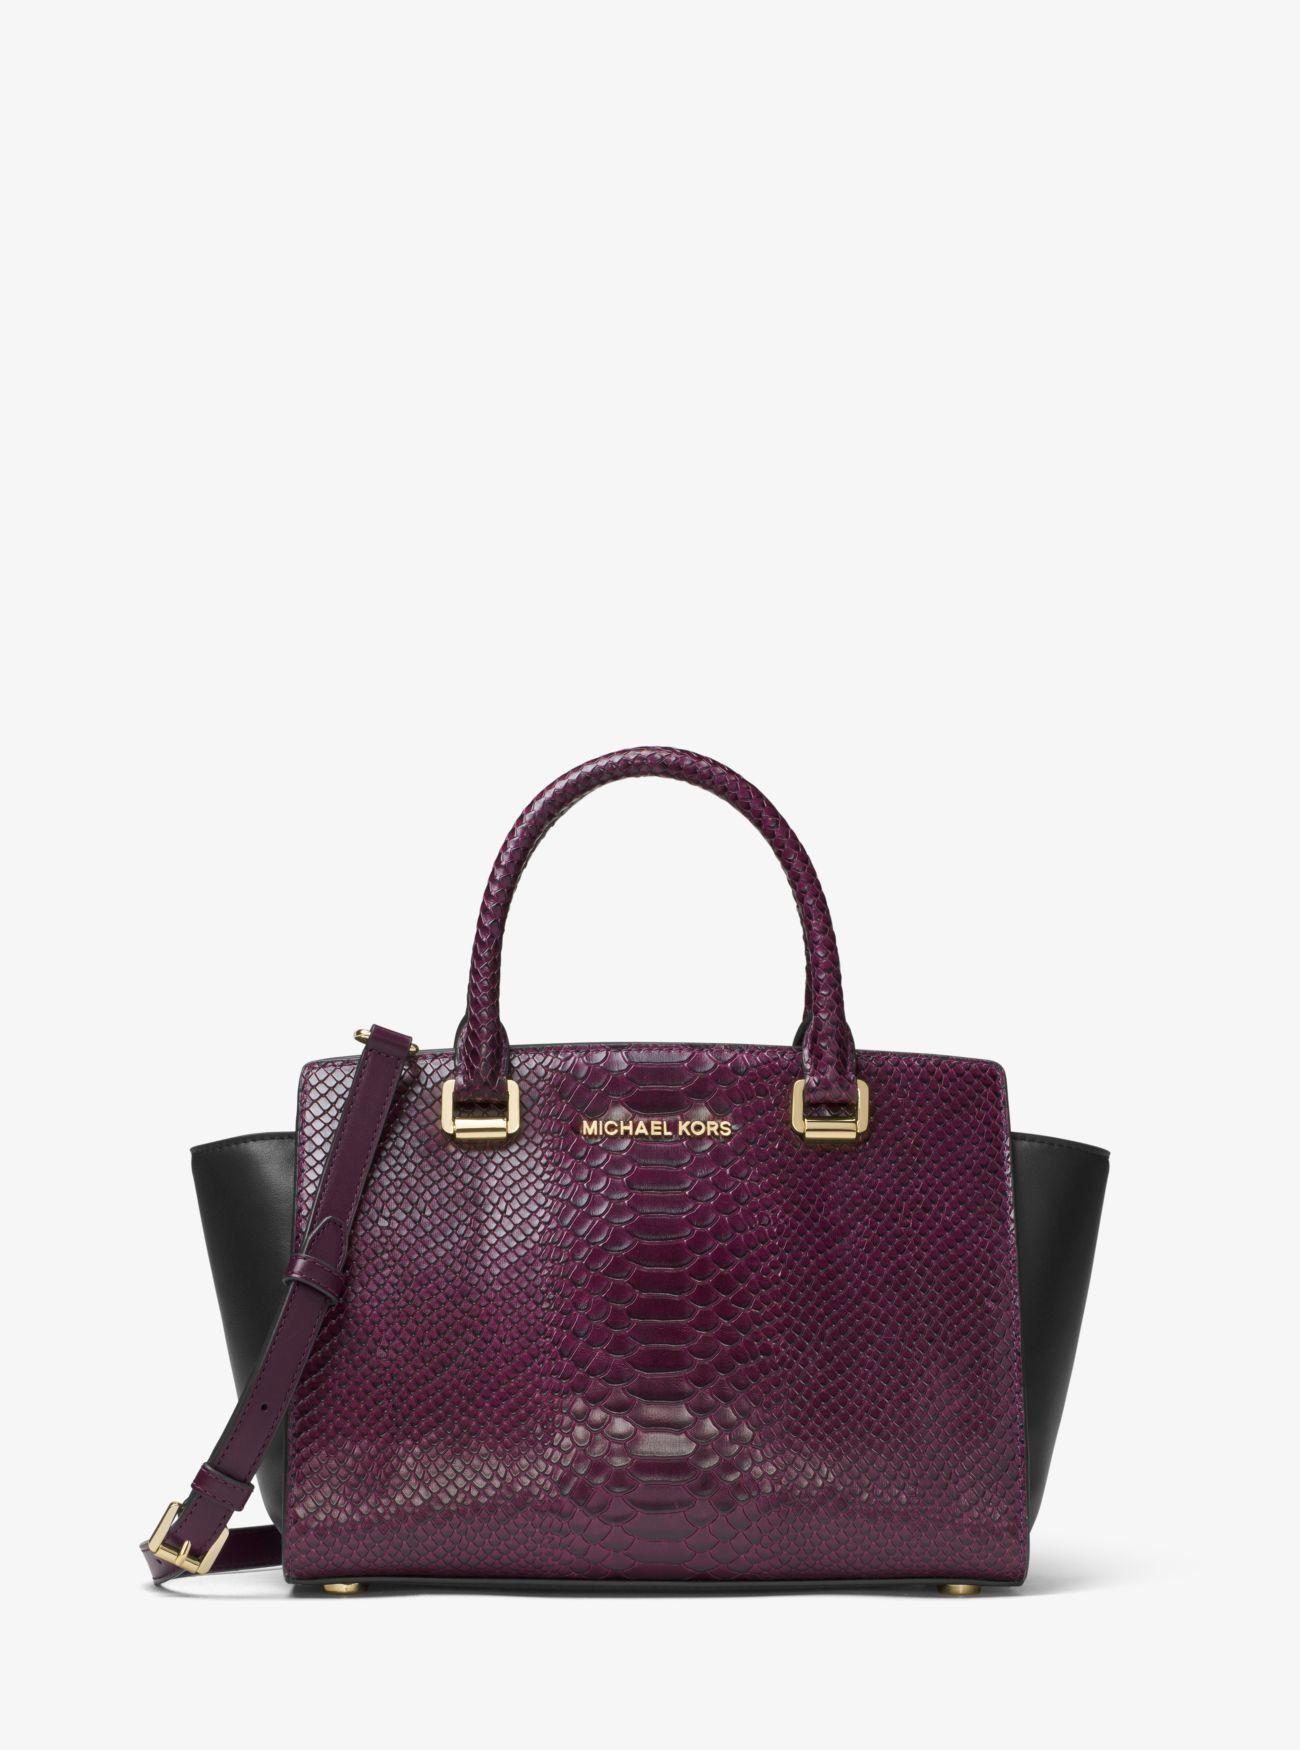 d2ef88c1ae55c Michael Kors Selma Embossed Leather Satchel Handbag Damson Black  30F7GLMS2EBLK DM -- Click image for more details. (This is an affiliate  link)   ...